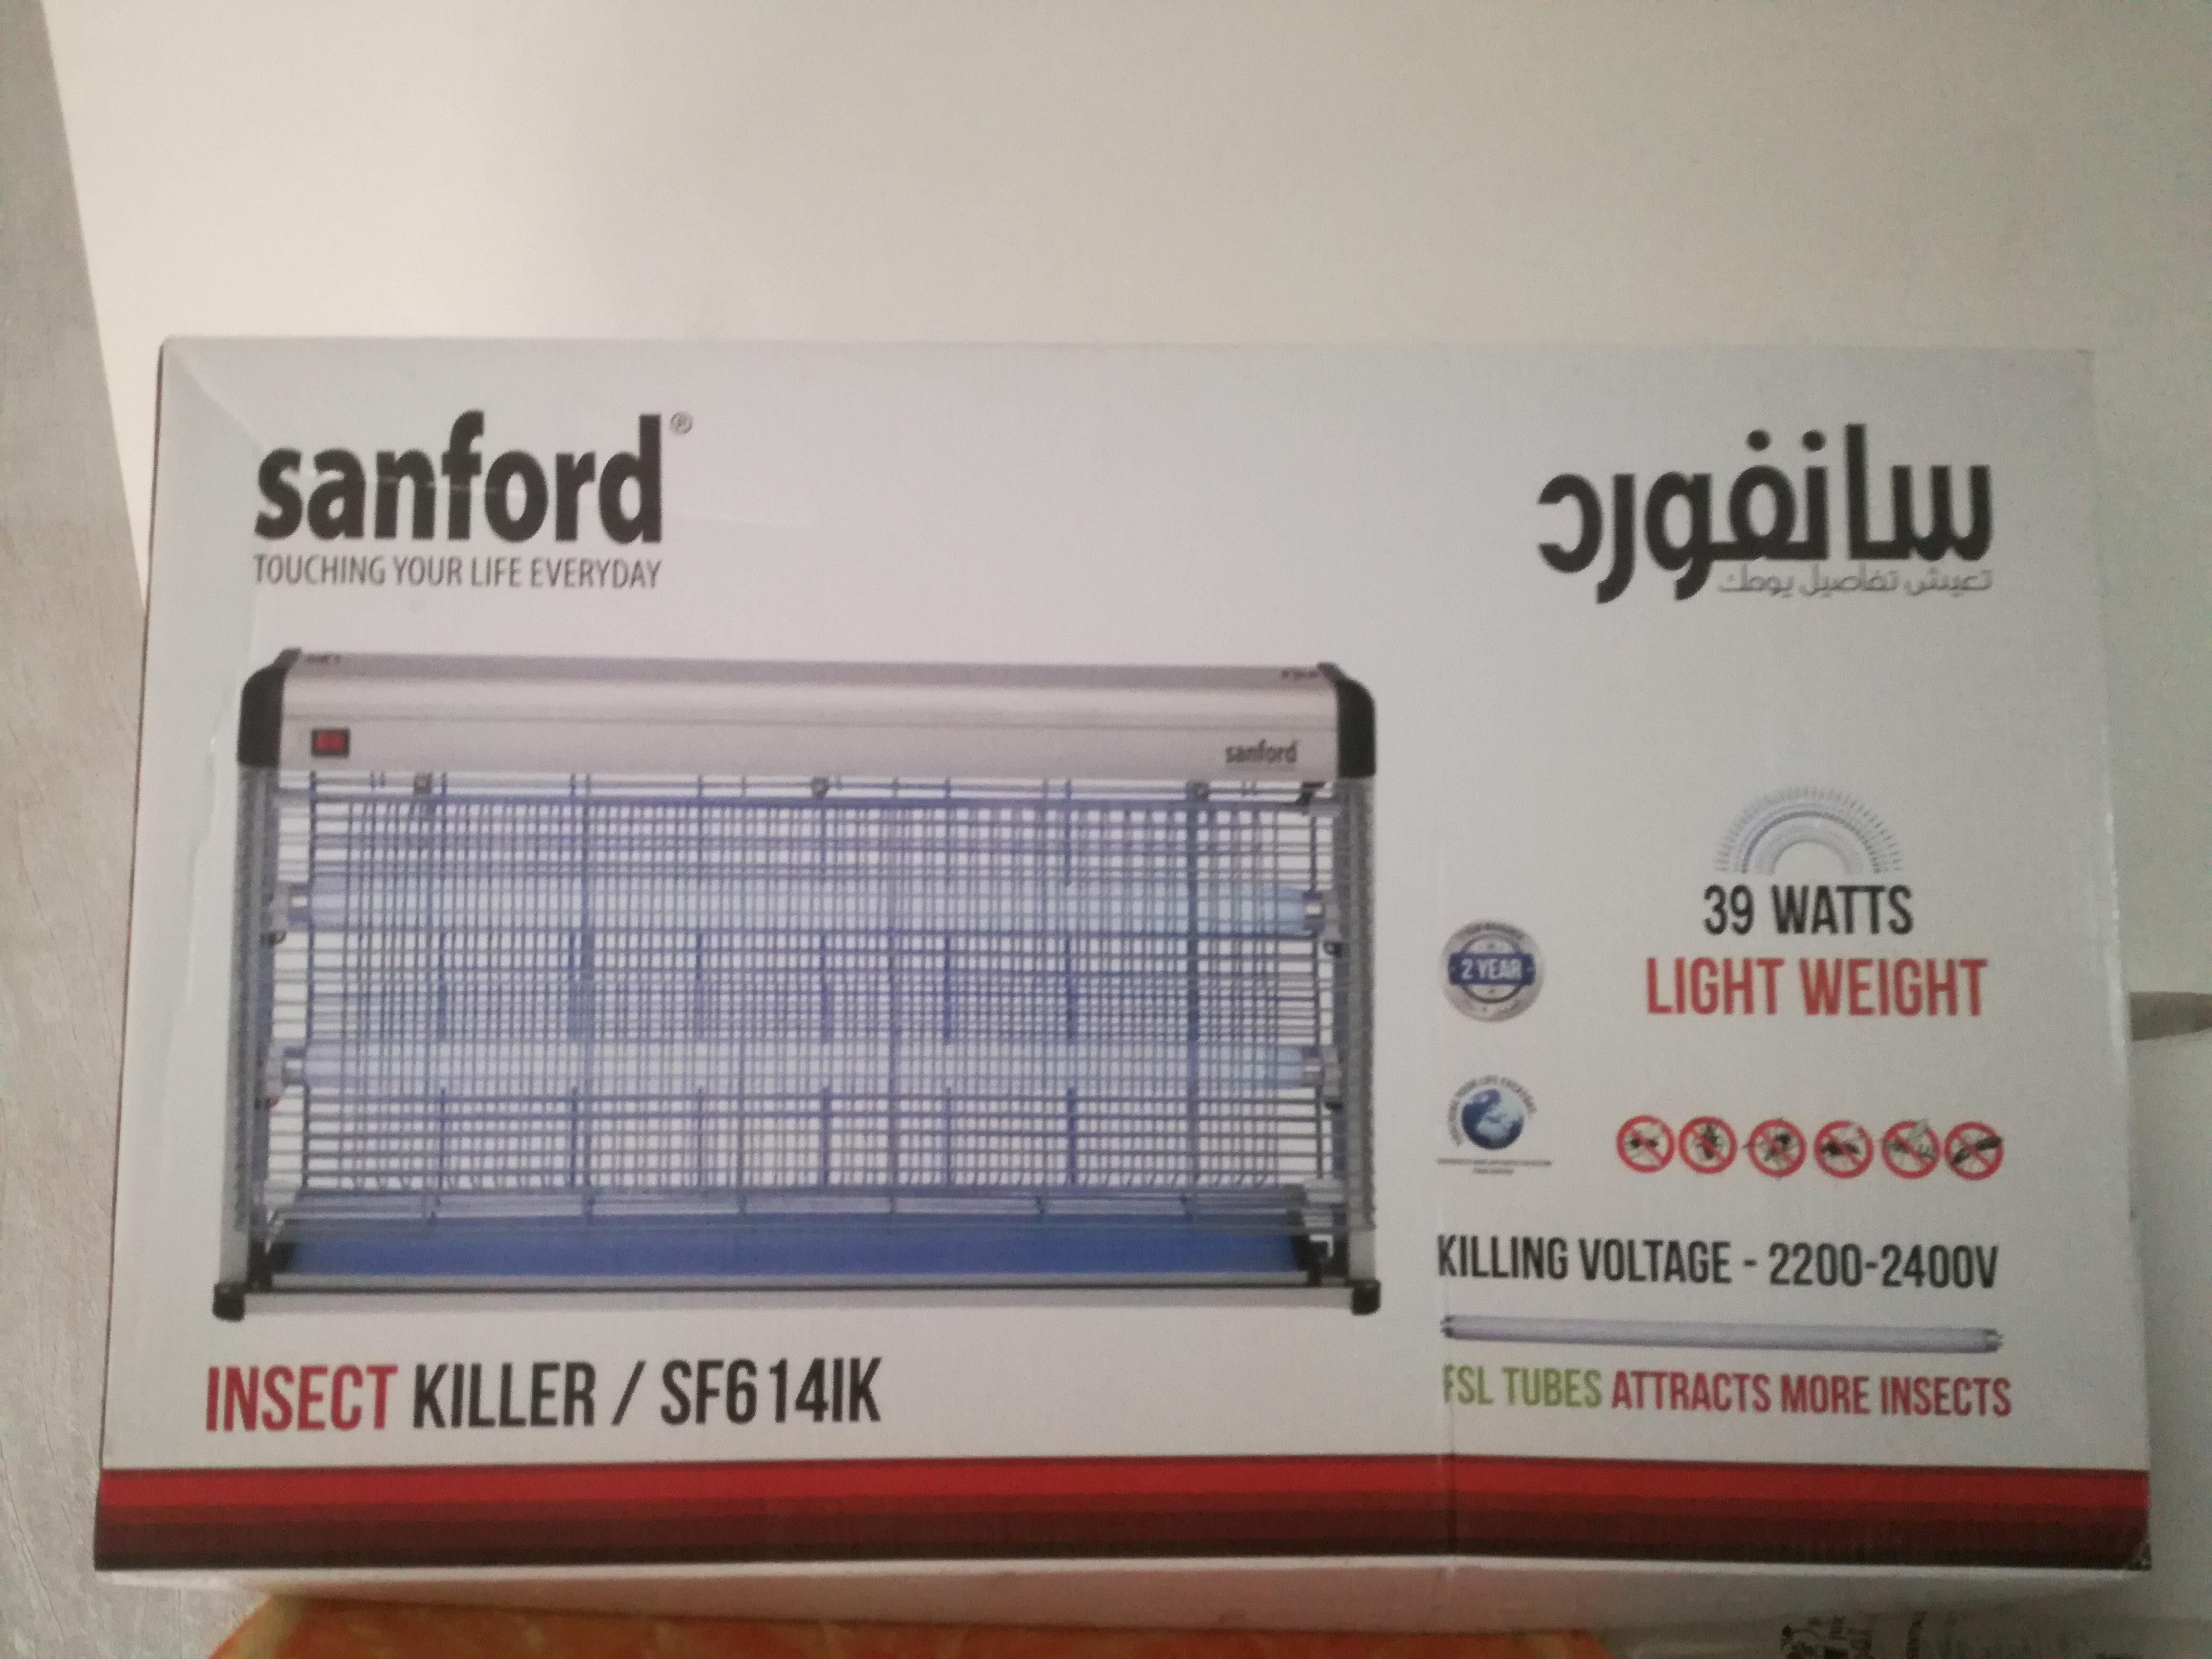 Sanford 39 Watt light weight INSECT BUG KILLER | Qatar Living